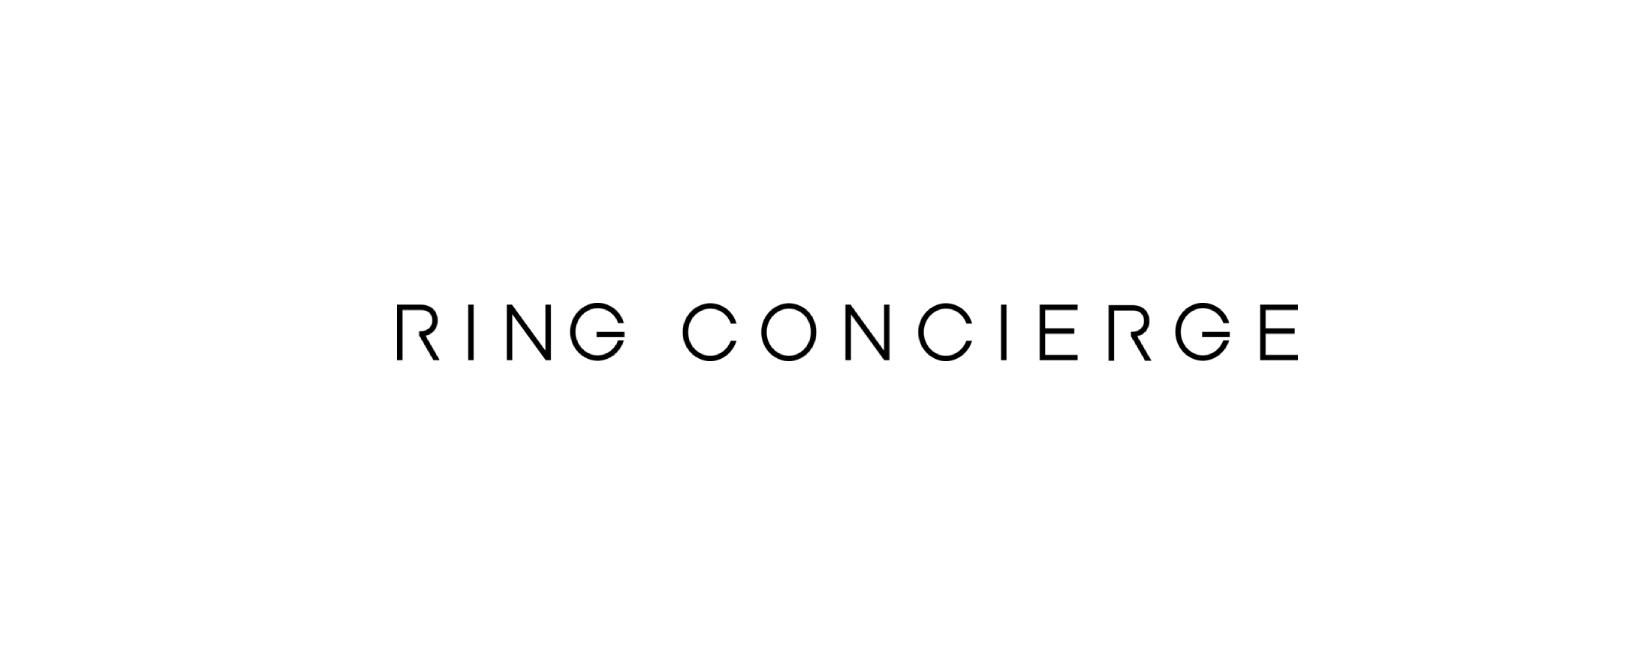 RING CONCIERGE REVIEW 2021 – Diamond Goals!